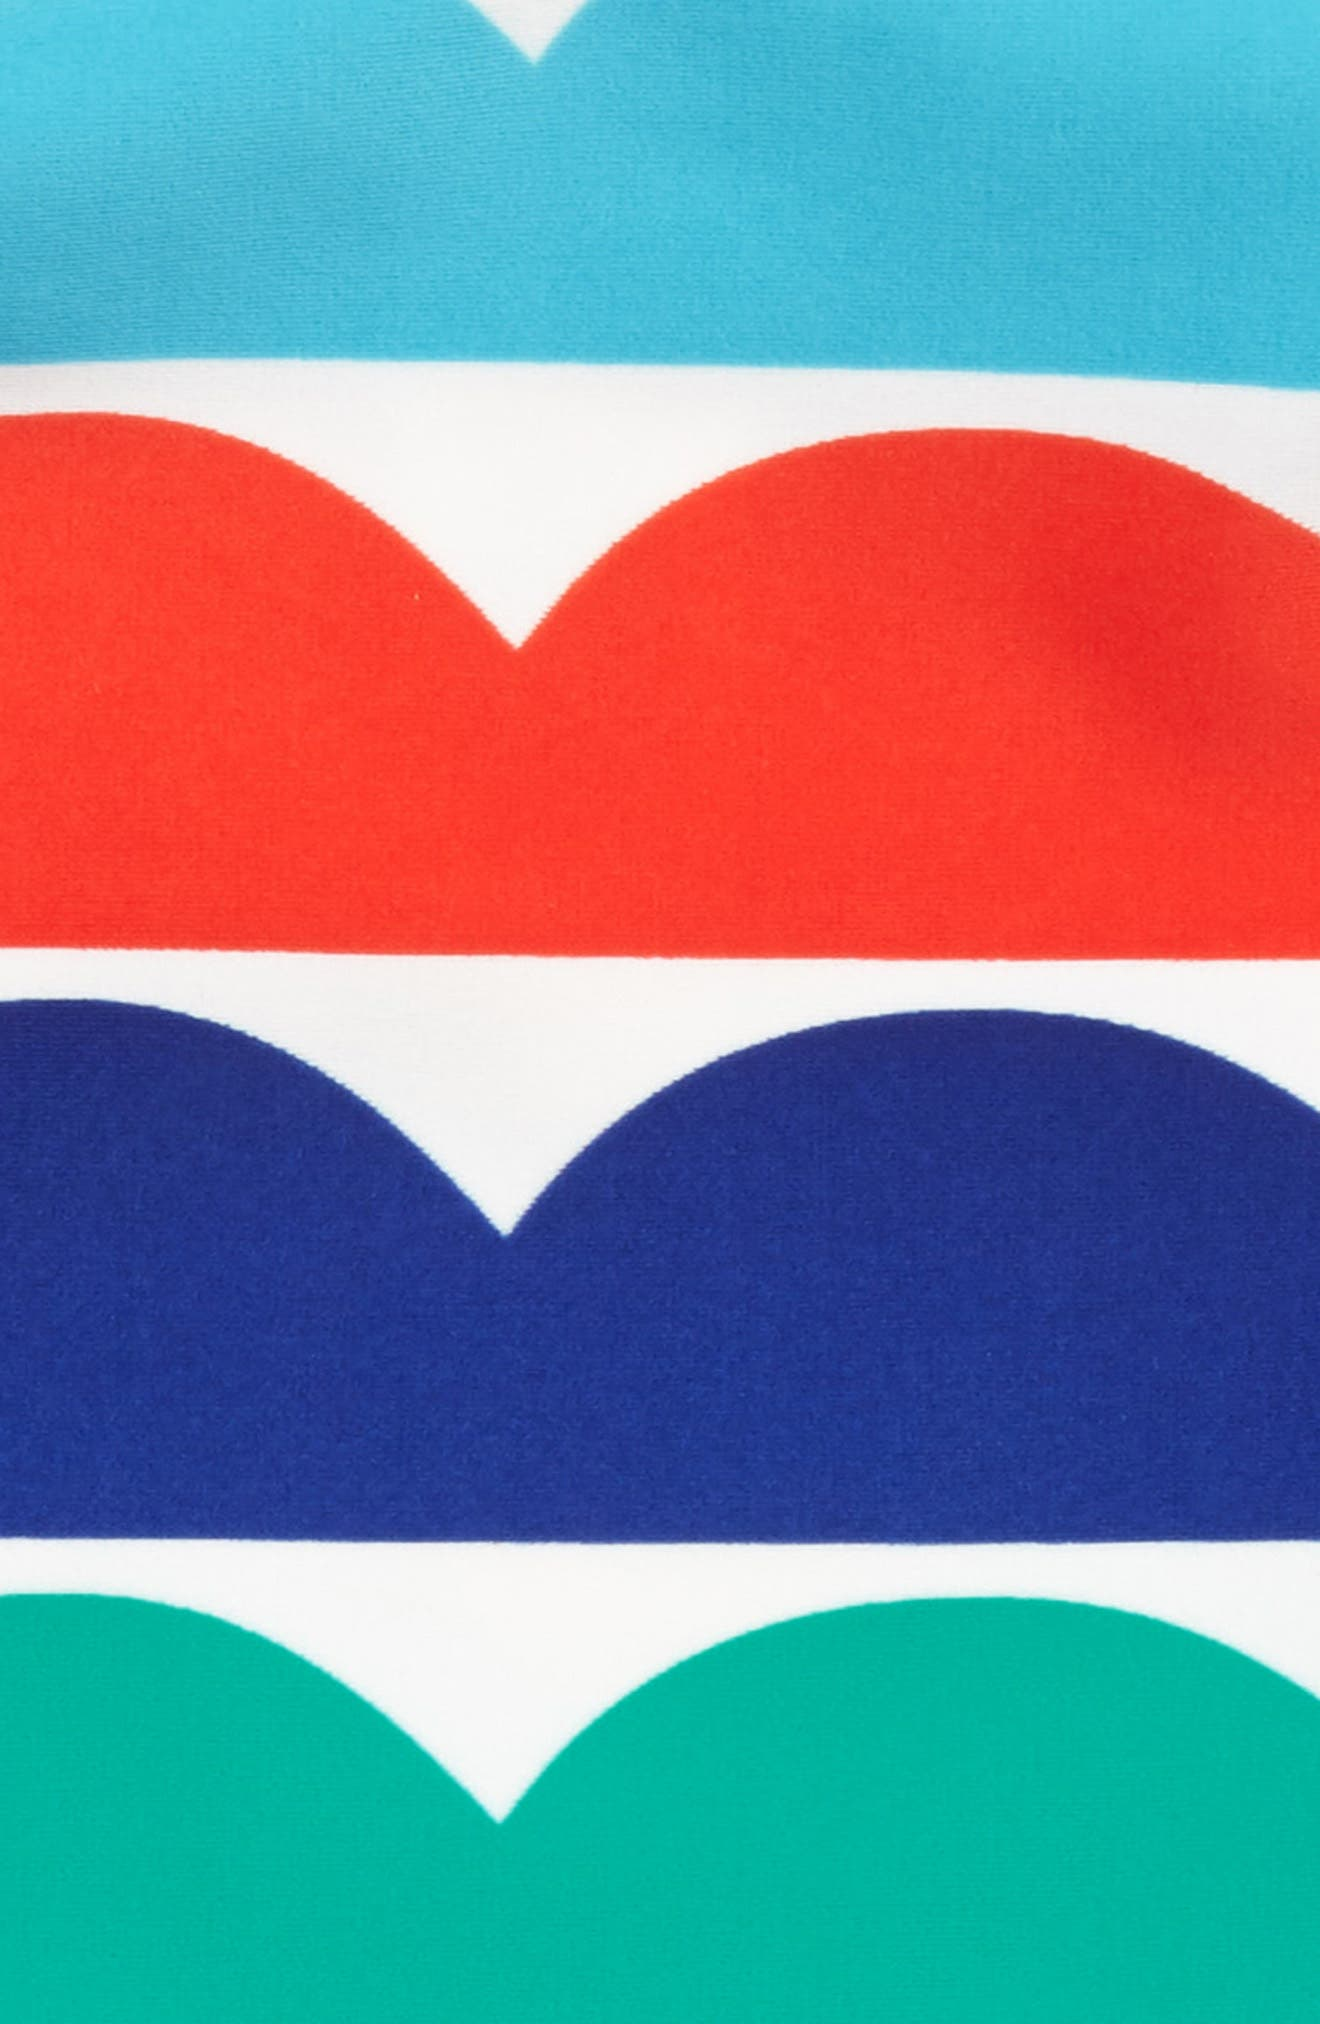 Two-Piece Tankini Swimsuit,                             Alternate thumbnail 2, color,                             Multi Rainbow Wave